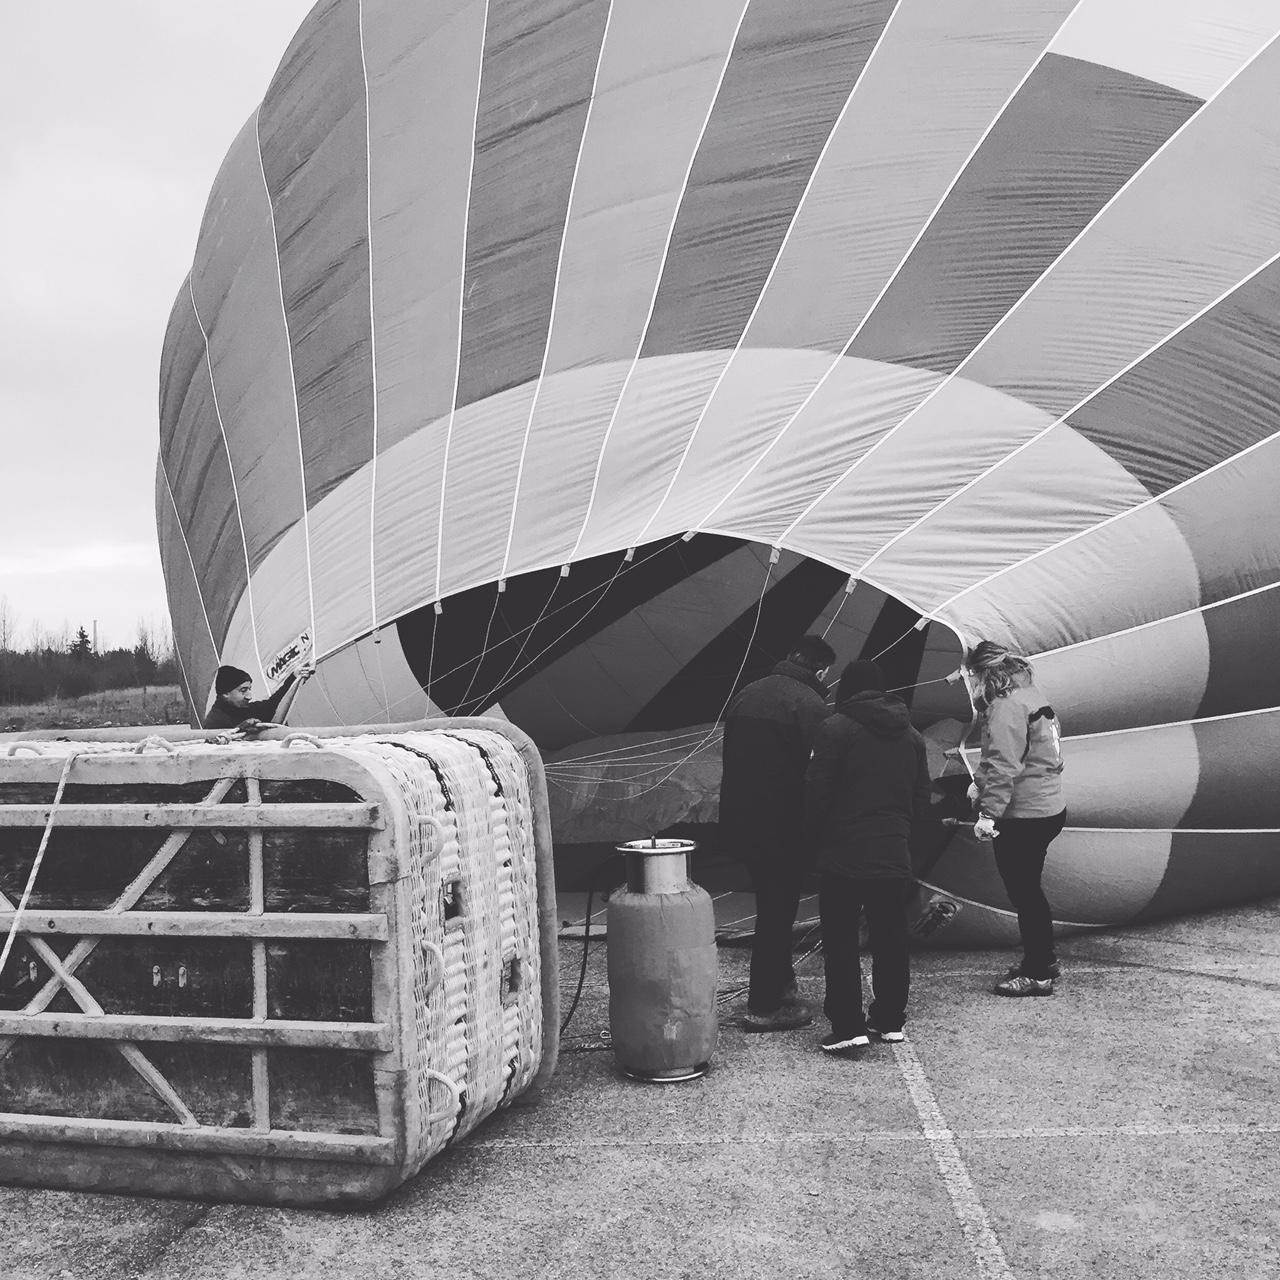 vuelo-en-globo-travesia